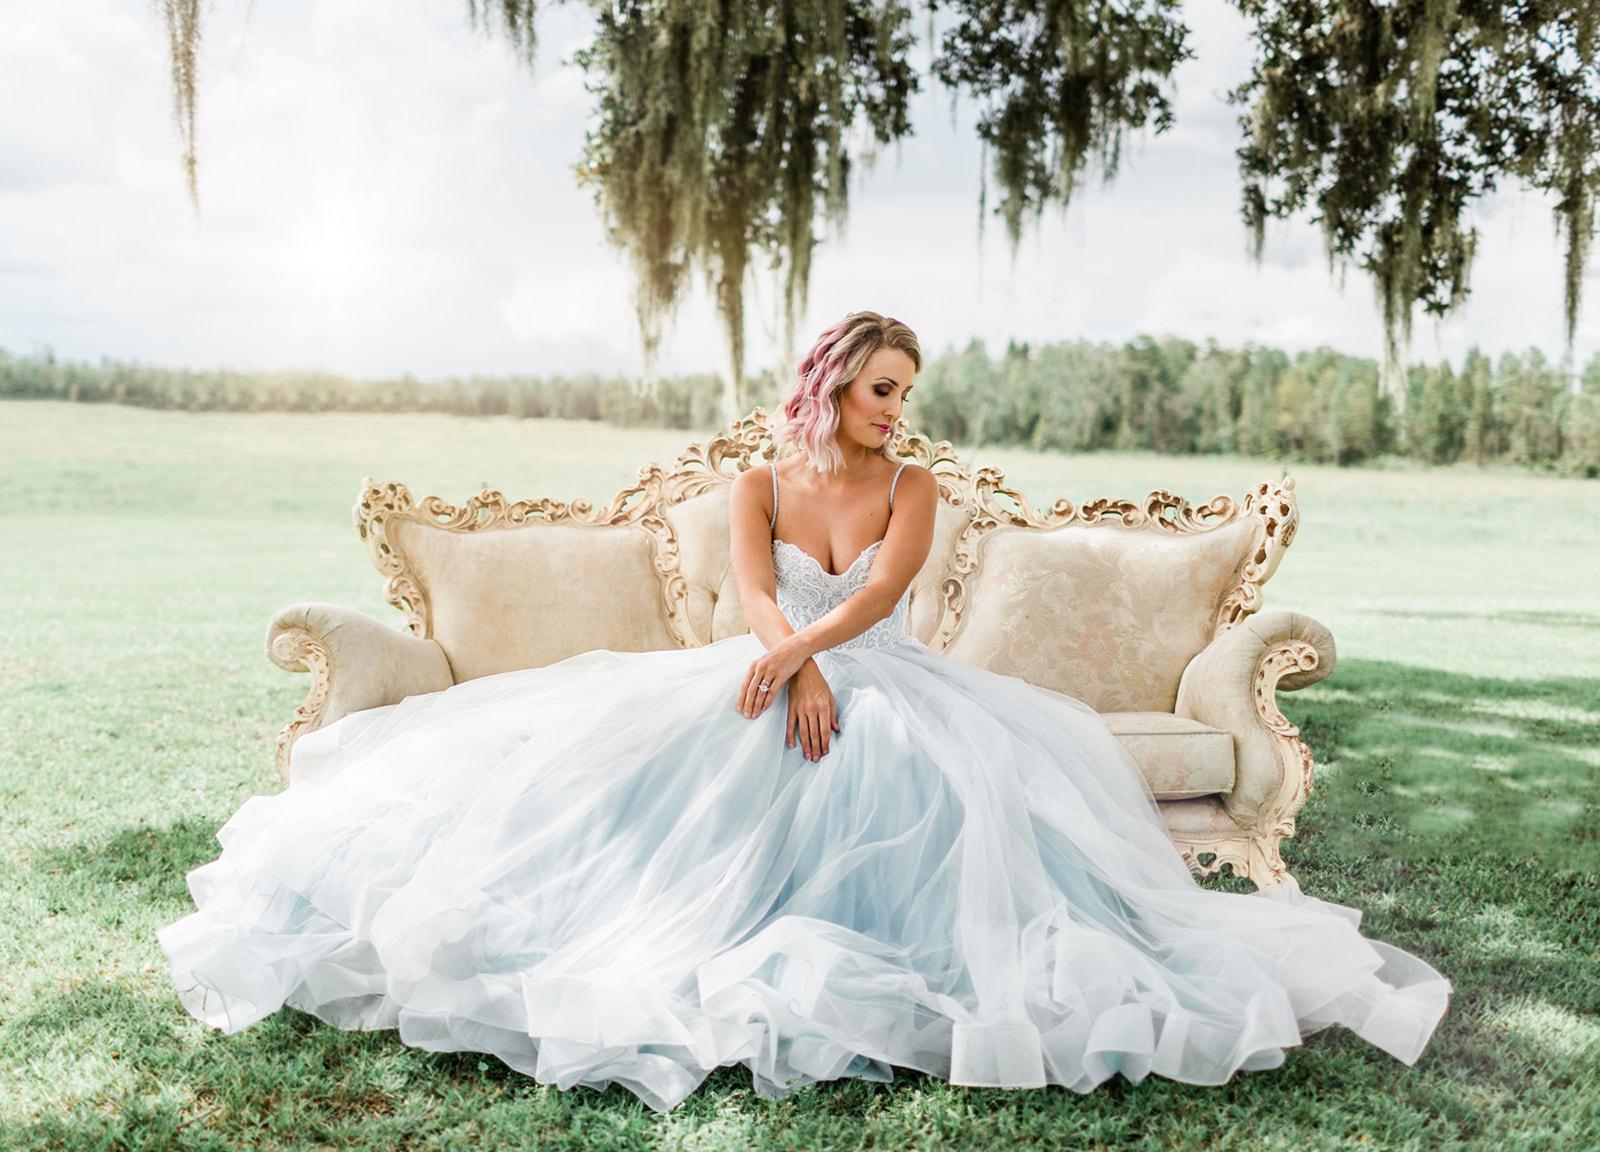 sunny-acres-lodge-orlando-florida-wedding-photos-1001_websize.jpg